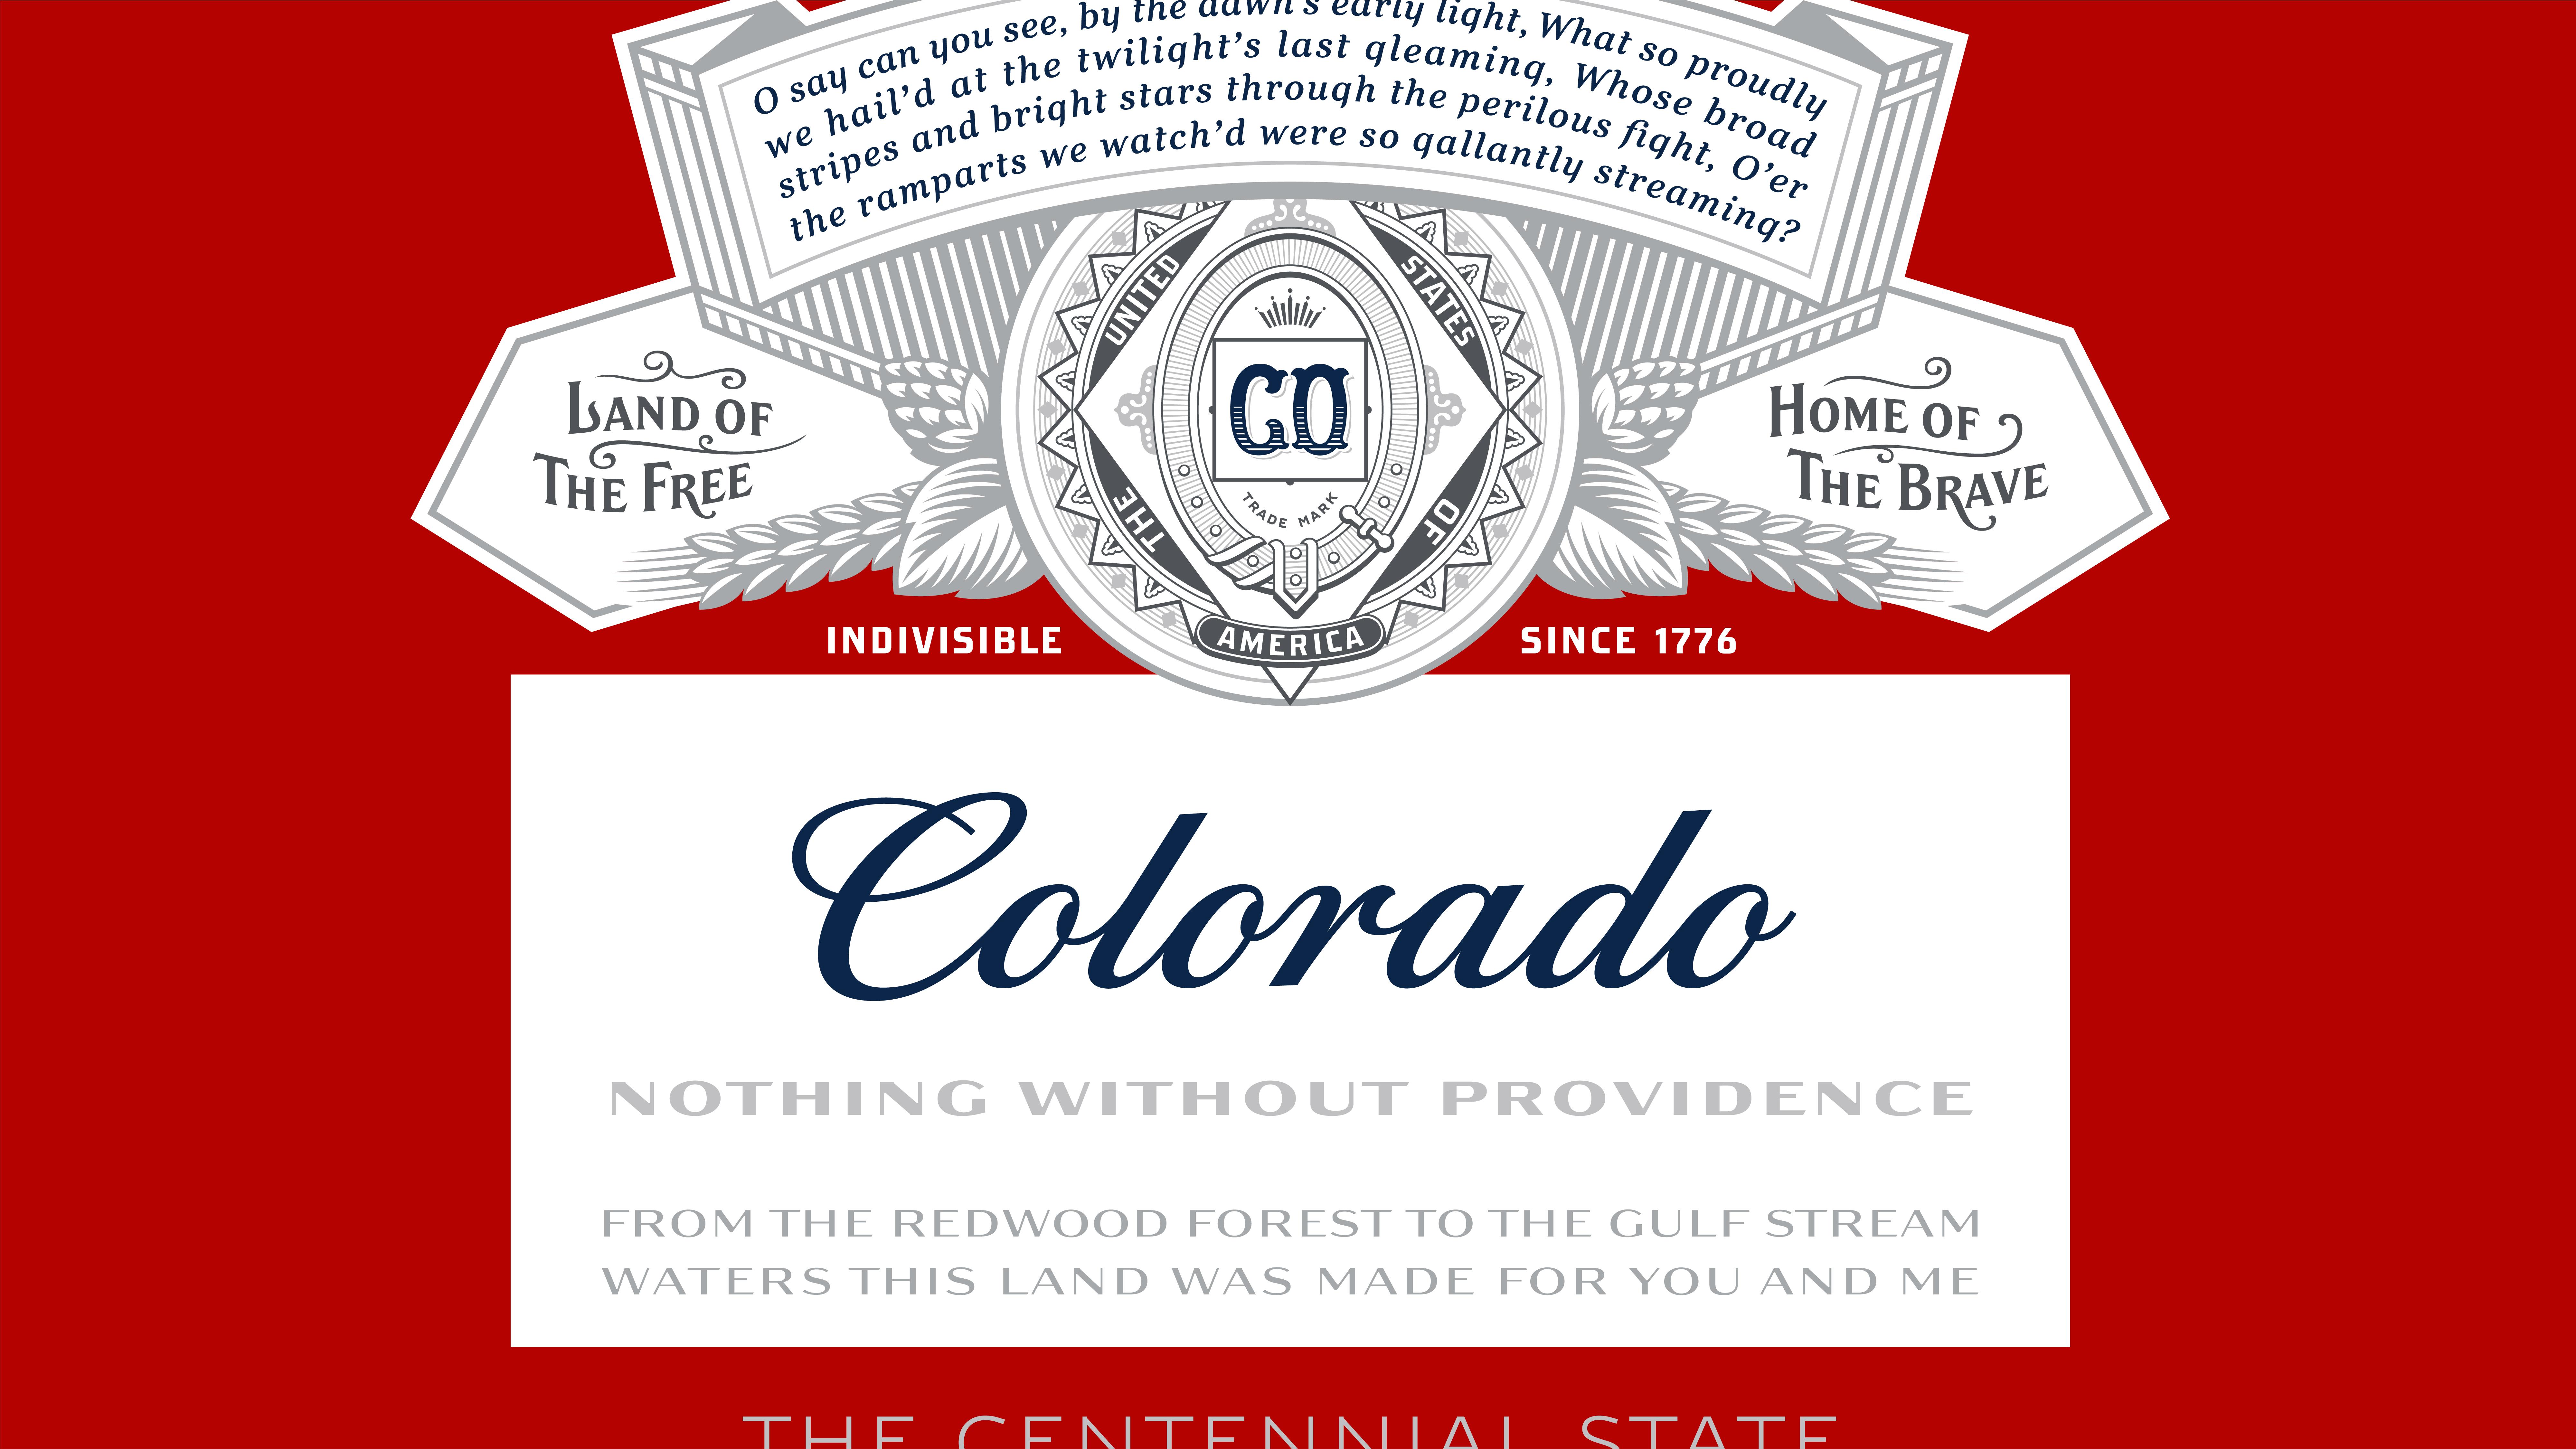 Bud_America_States_PR_Flats_CO_Flat.jpg